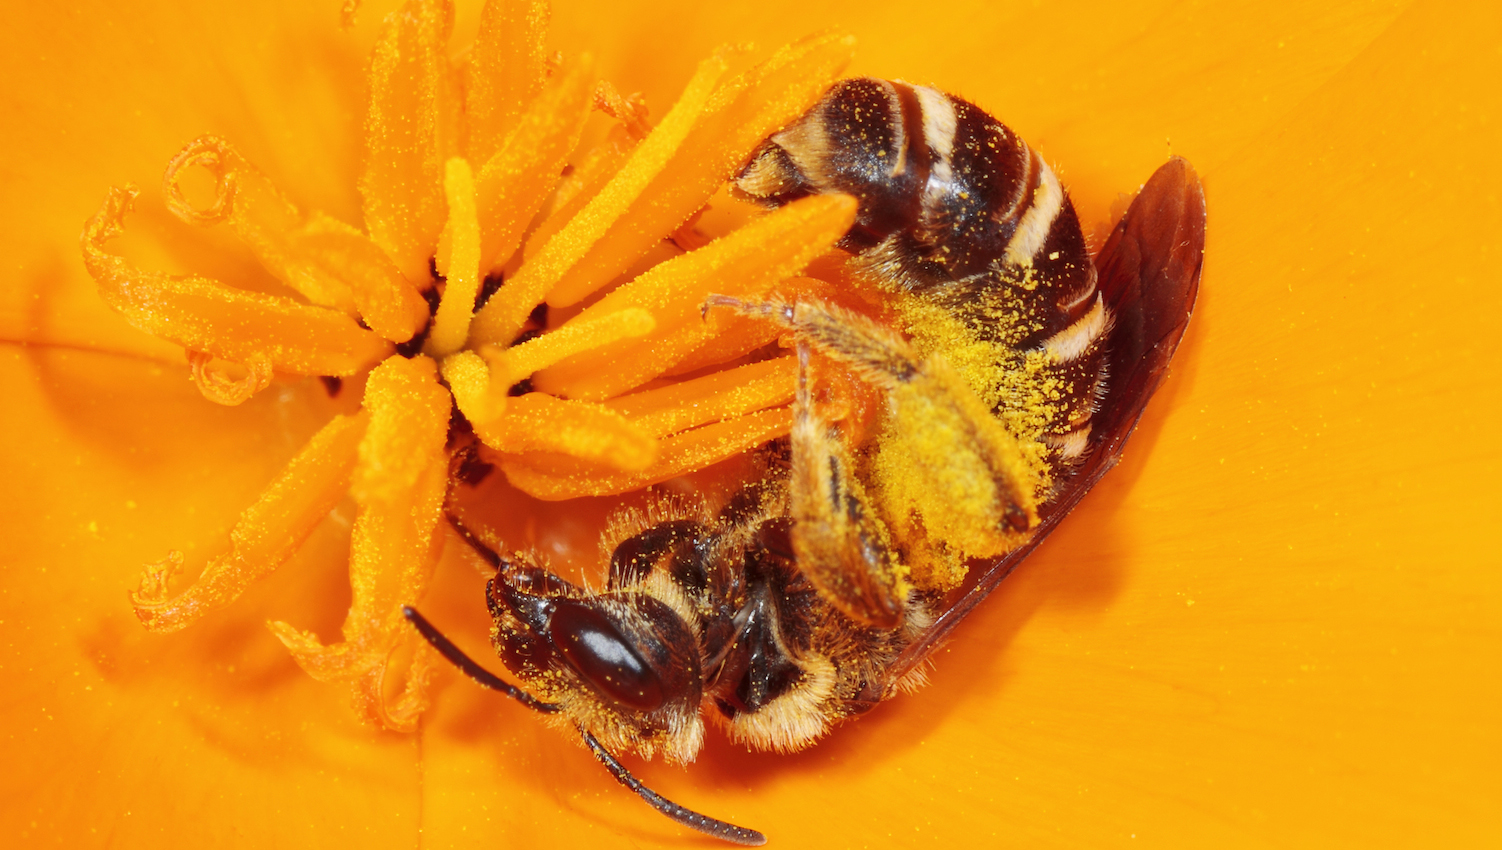 Sweat bee on a California poppy